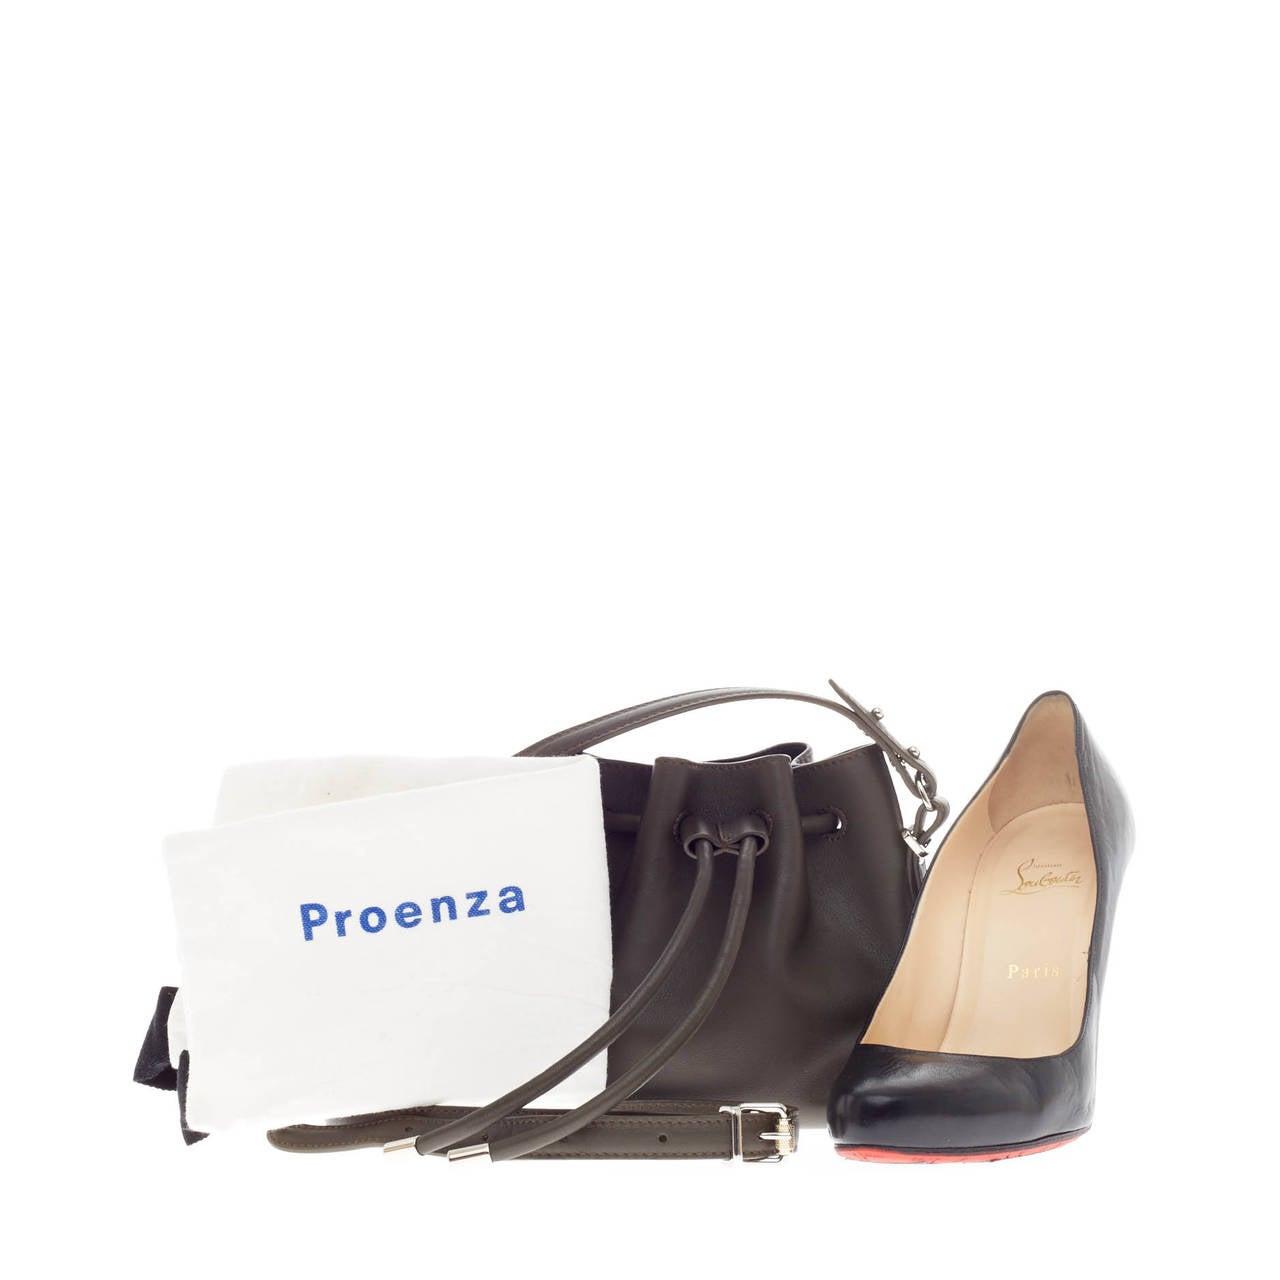 Proenza Schouler Bucket Bag Leather Tiny 2